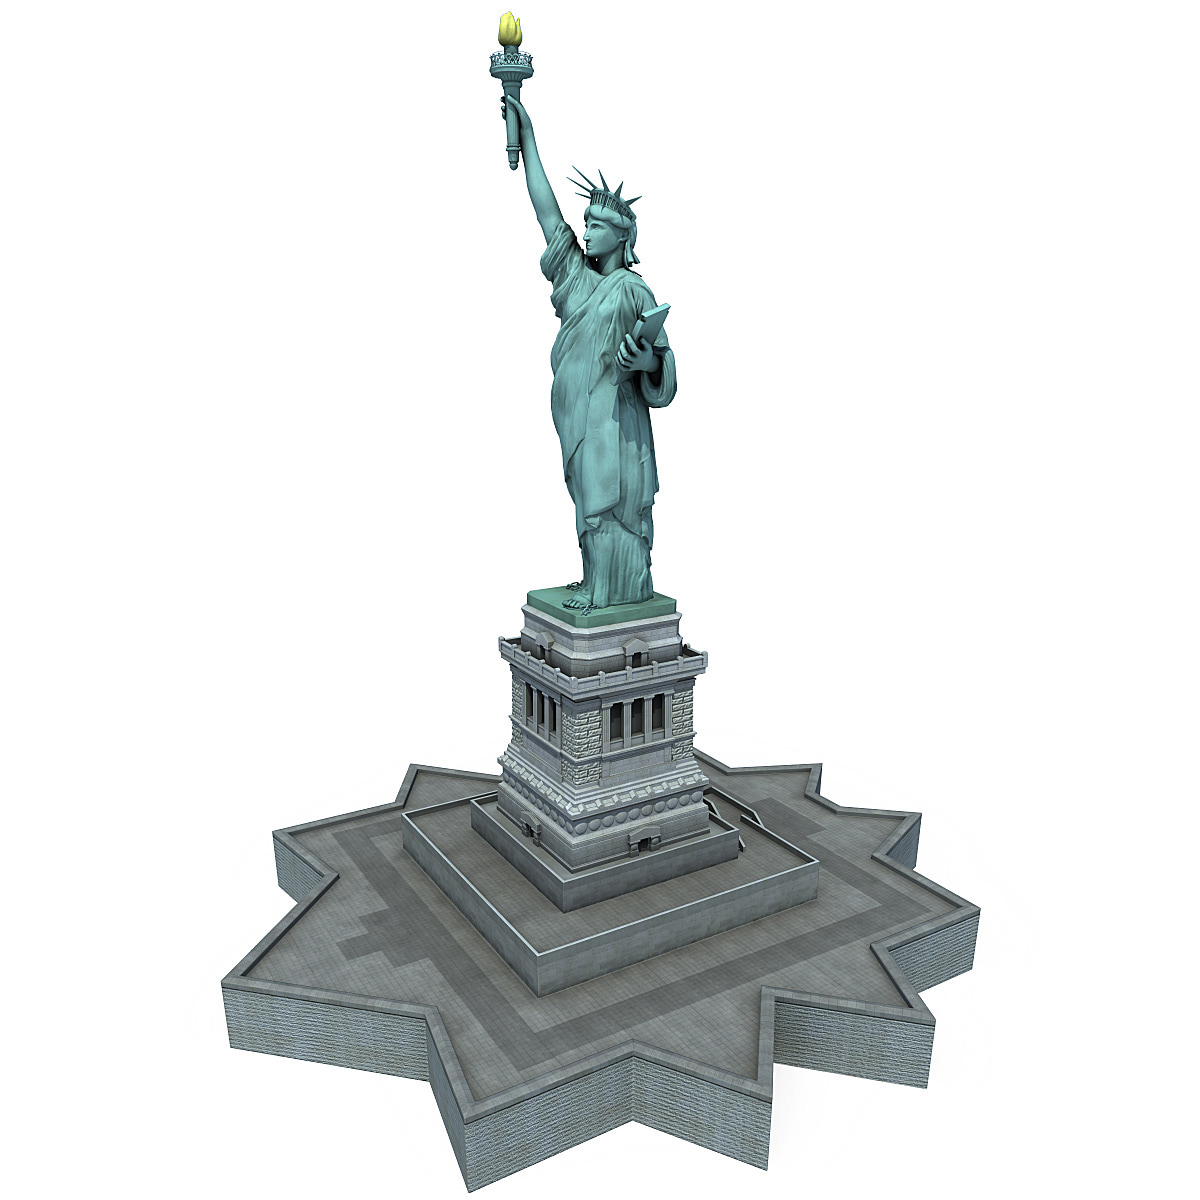 Statue_of_Liberty_001.jpg